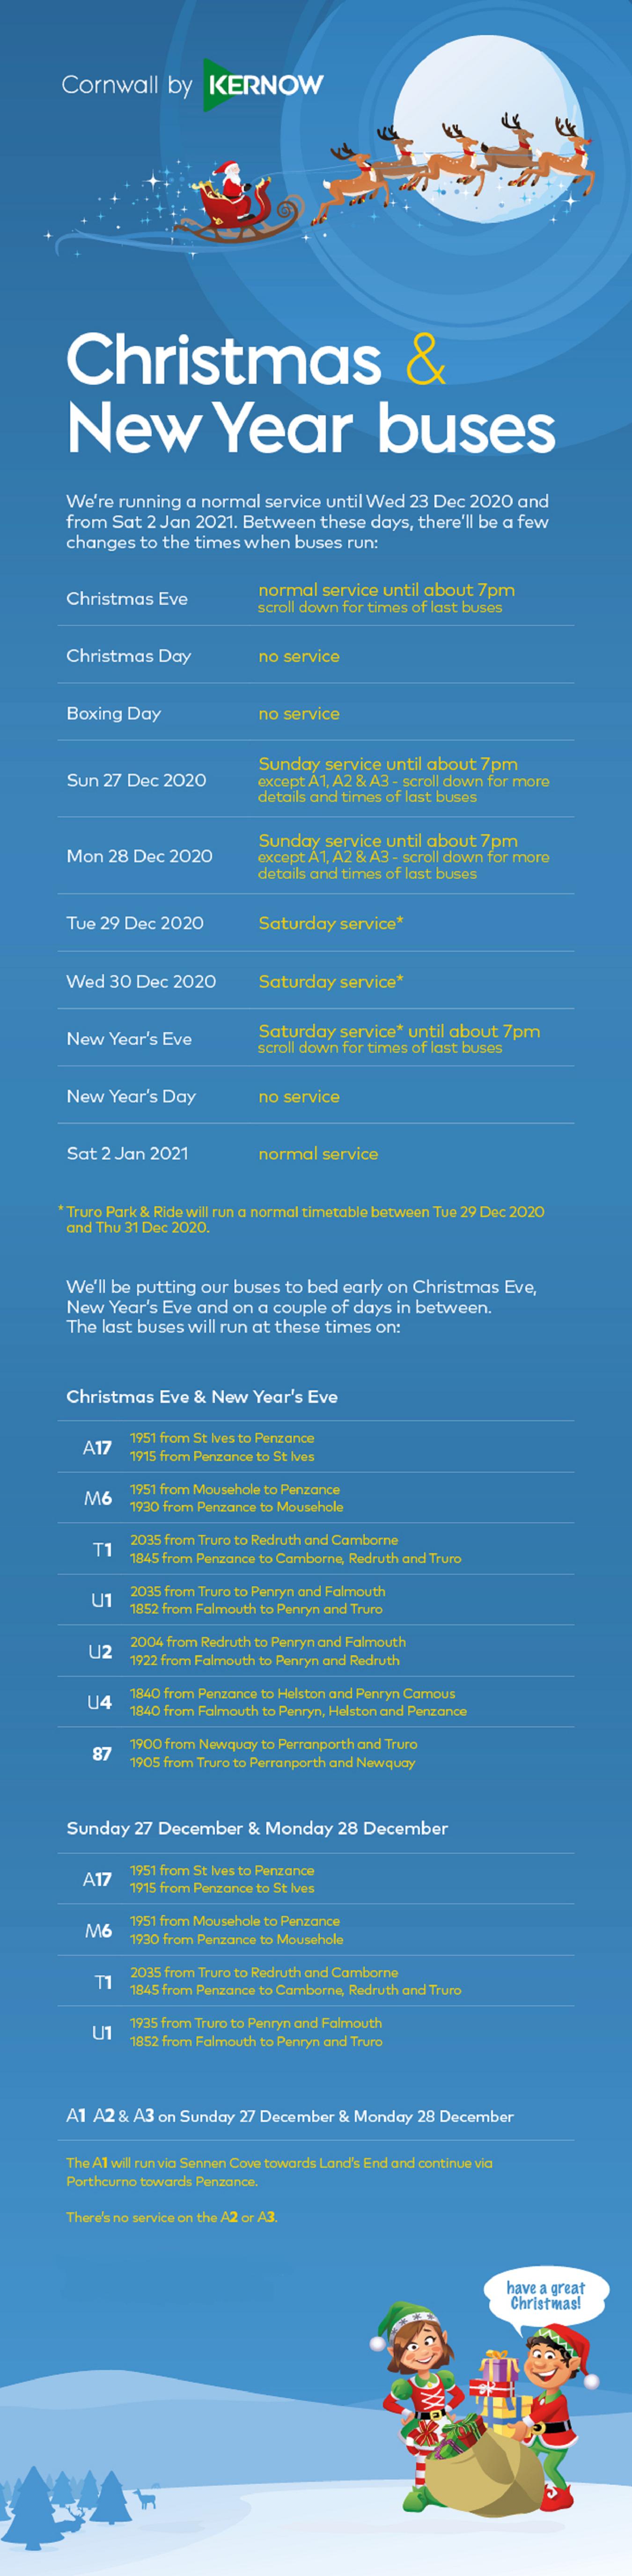 First Kernow Christmas